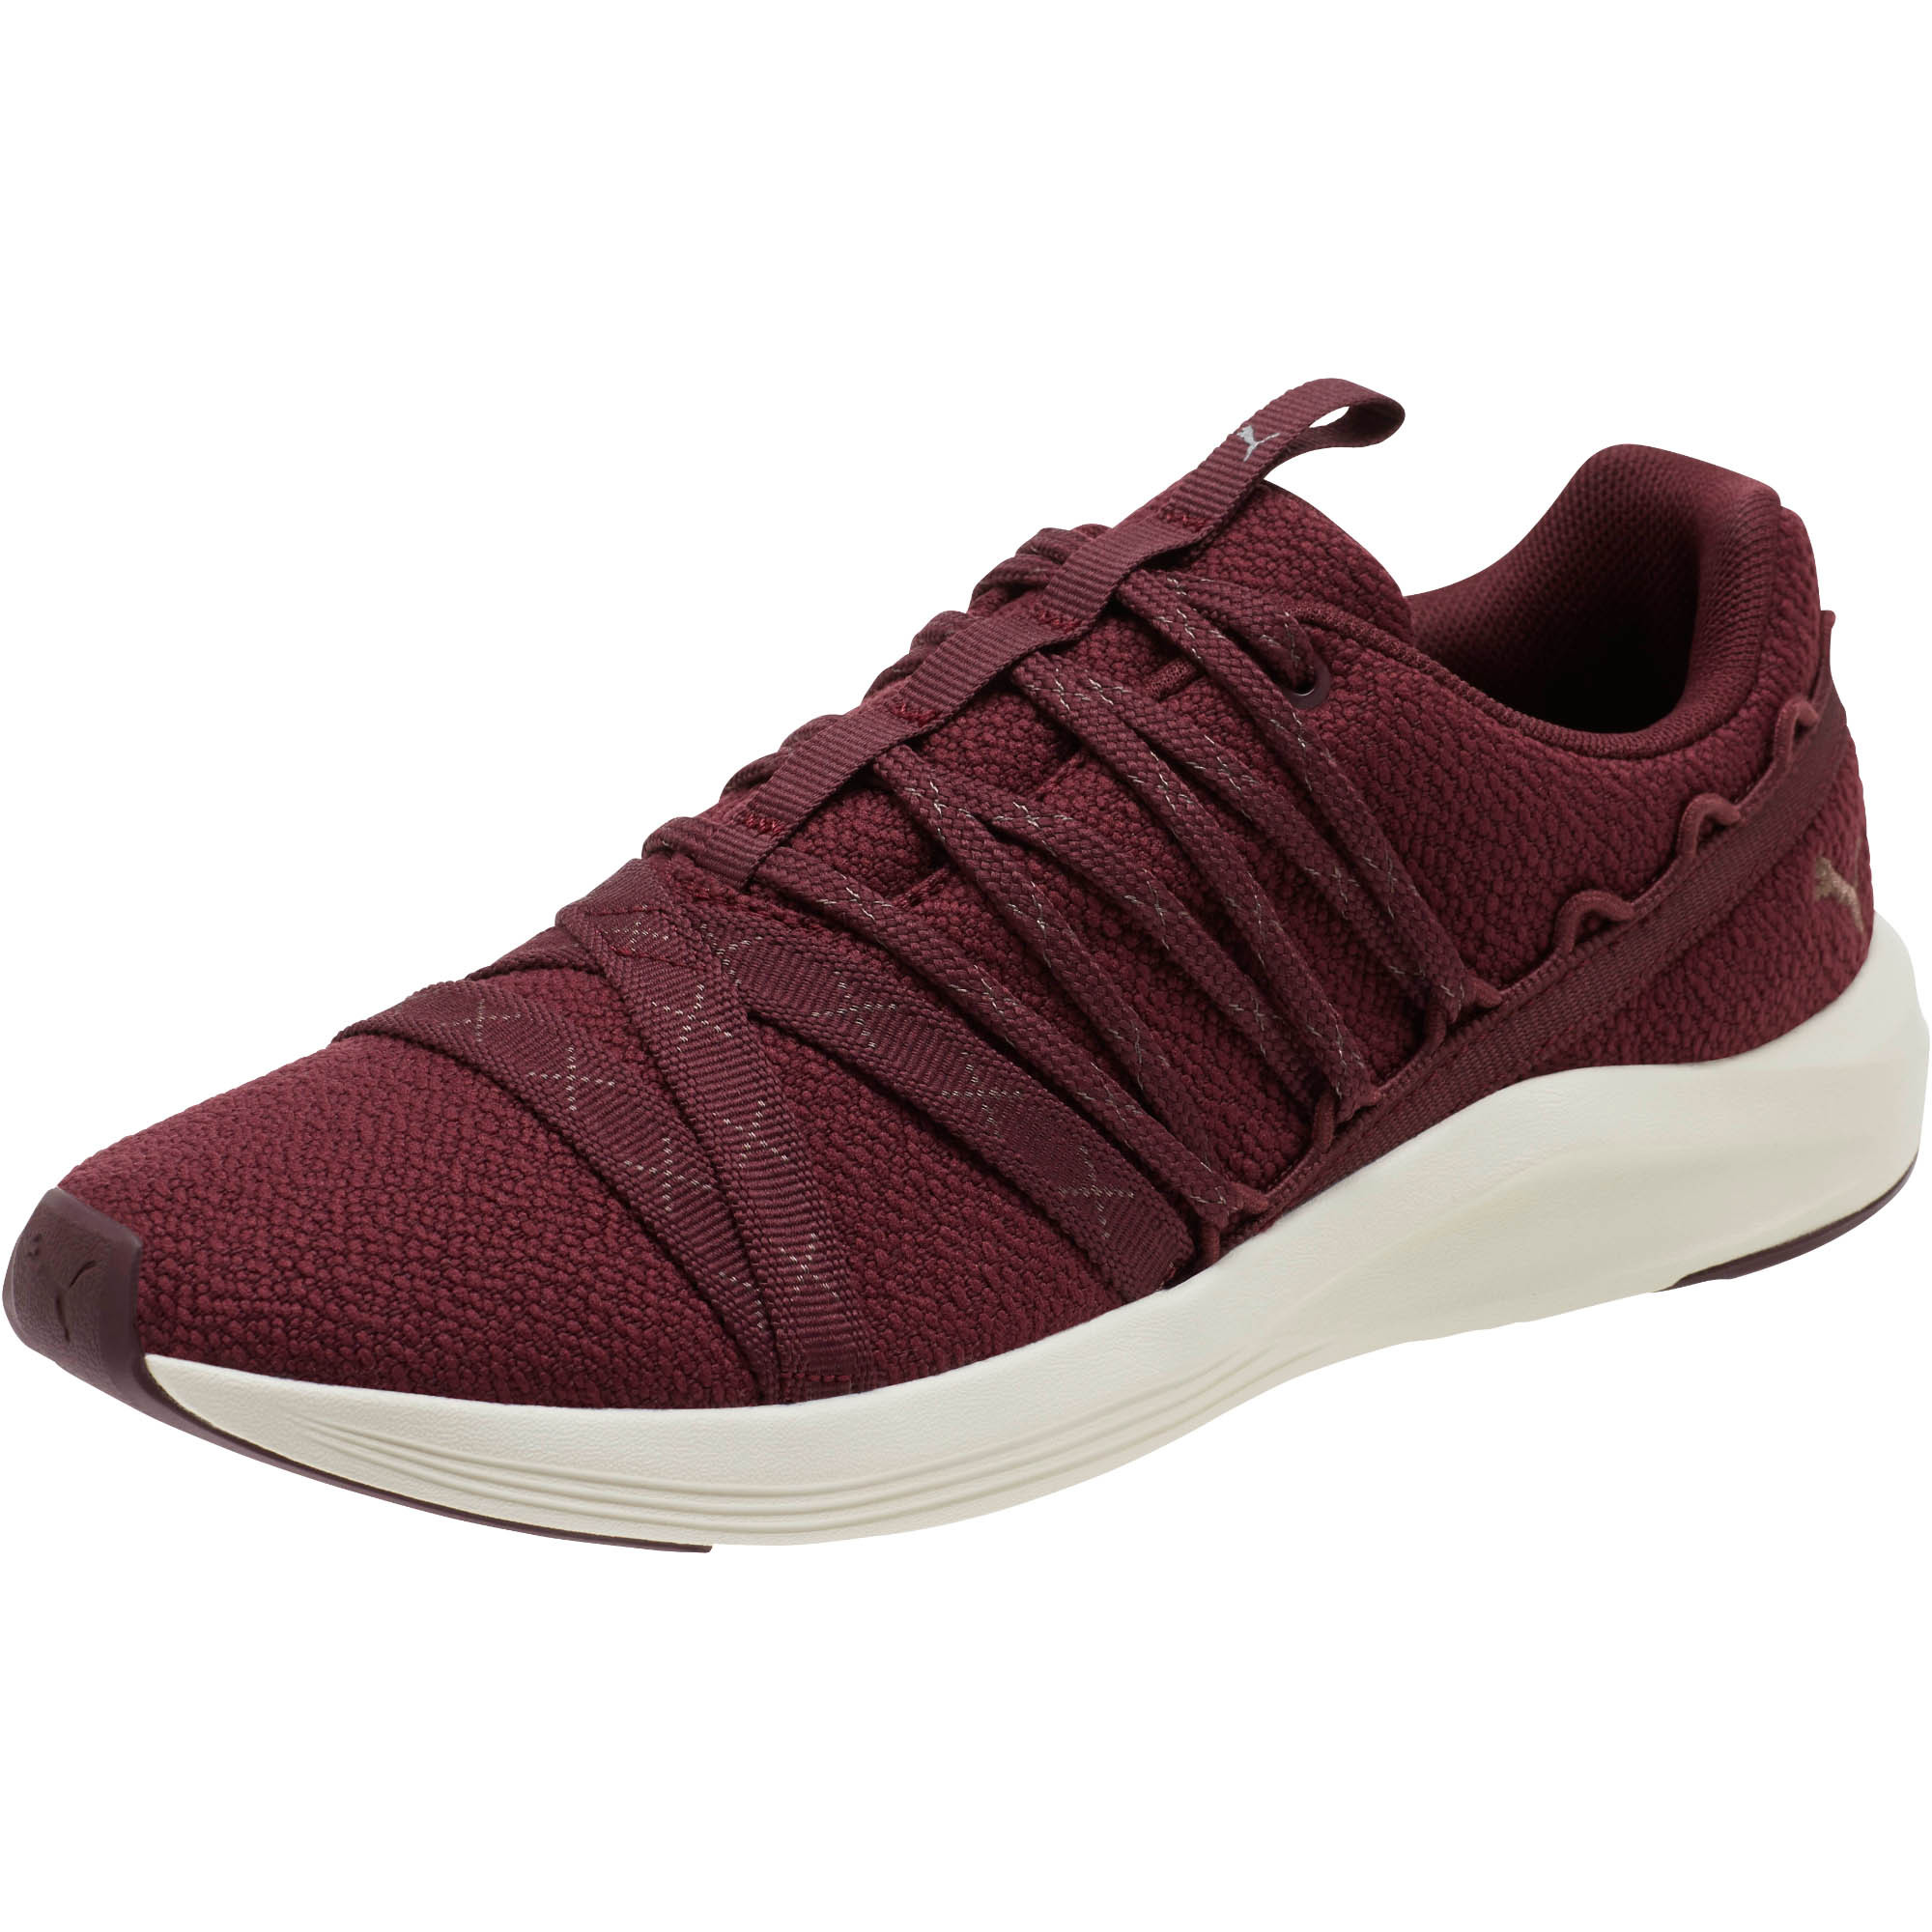 PUMA-Prowl-Alt-2-LX-Women-039-s-Training-Shoes-Women-Shoe-Training thumbnail 4